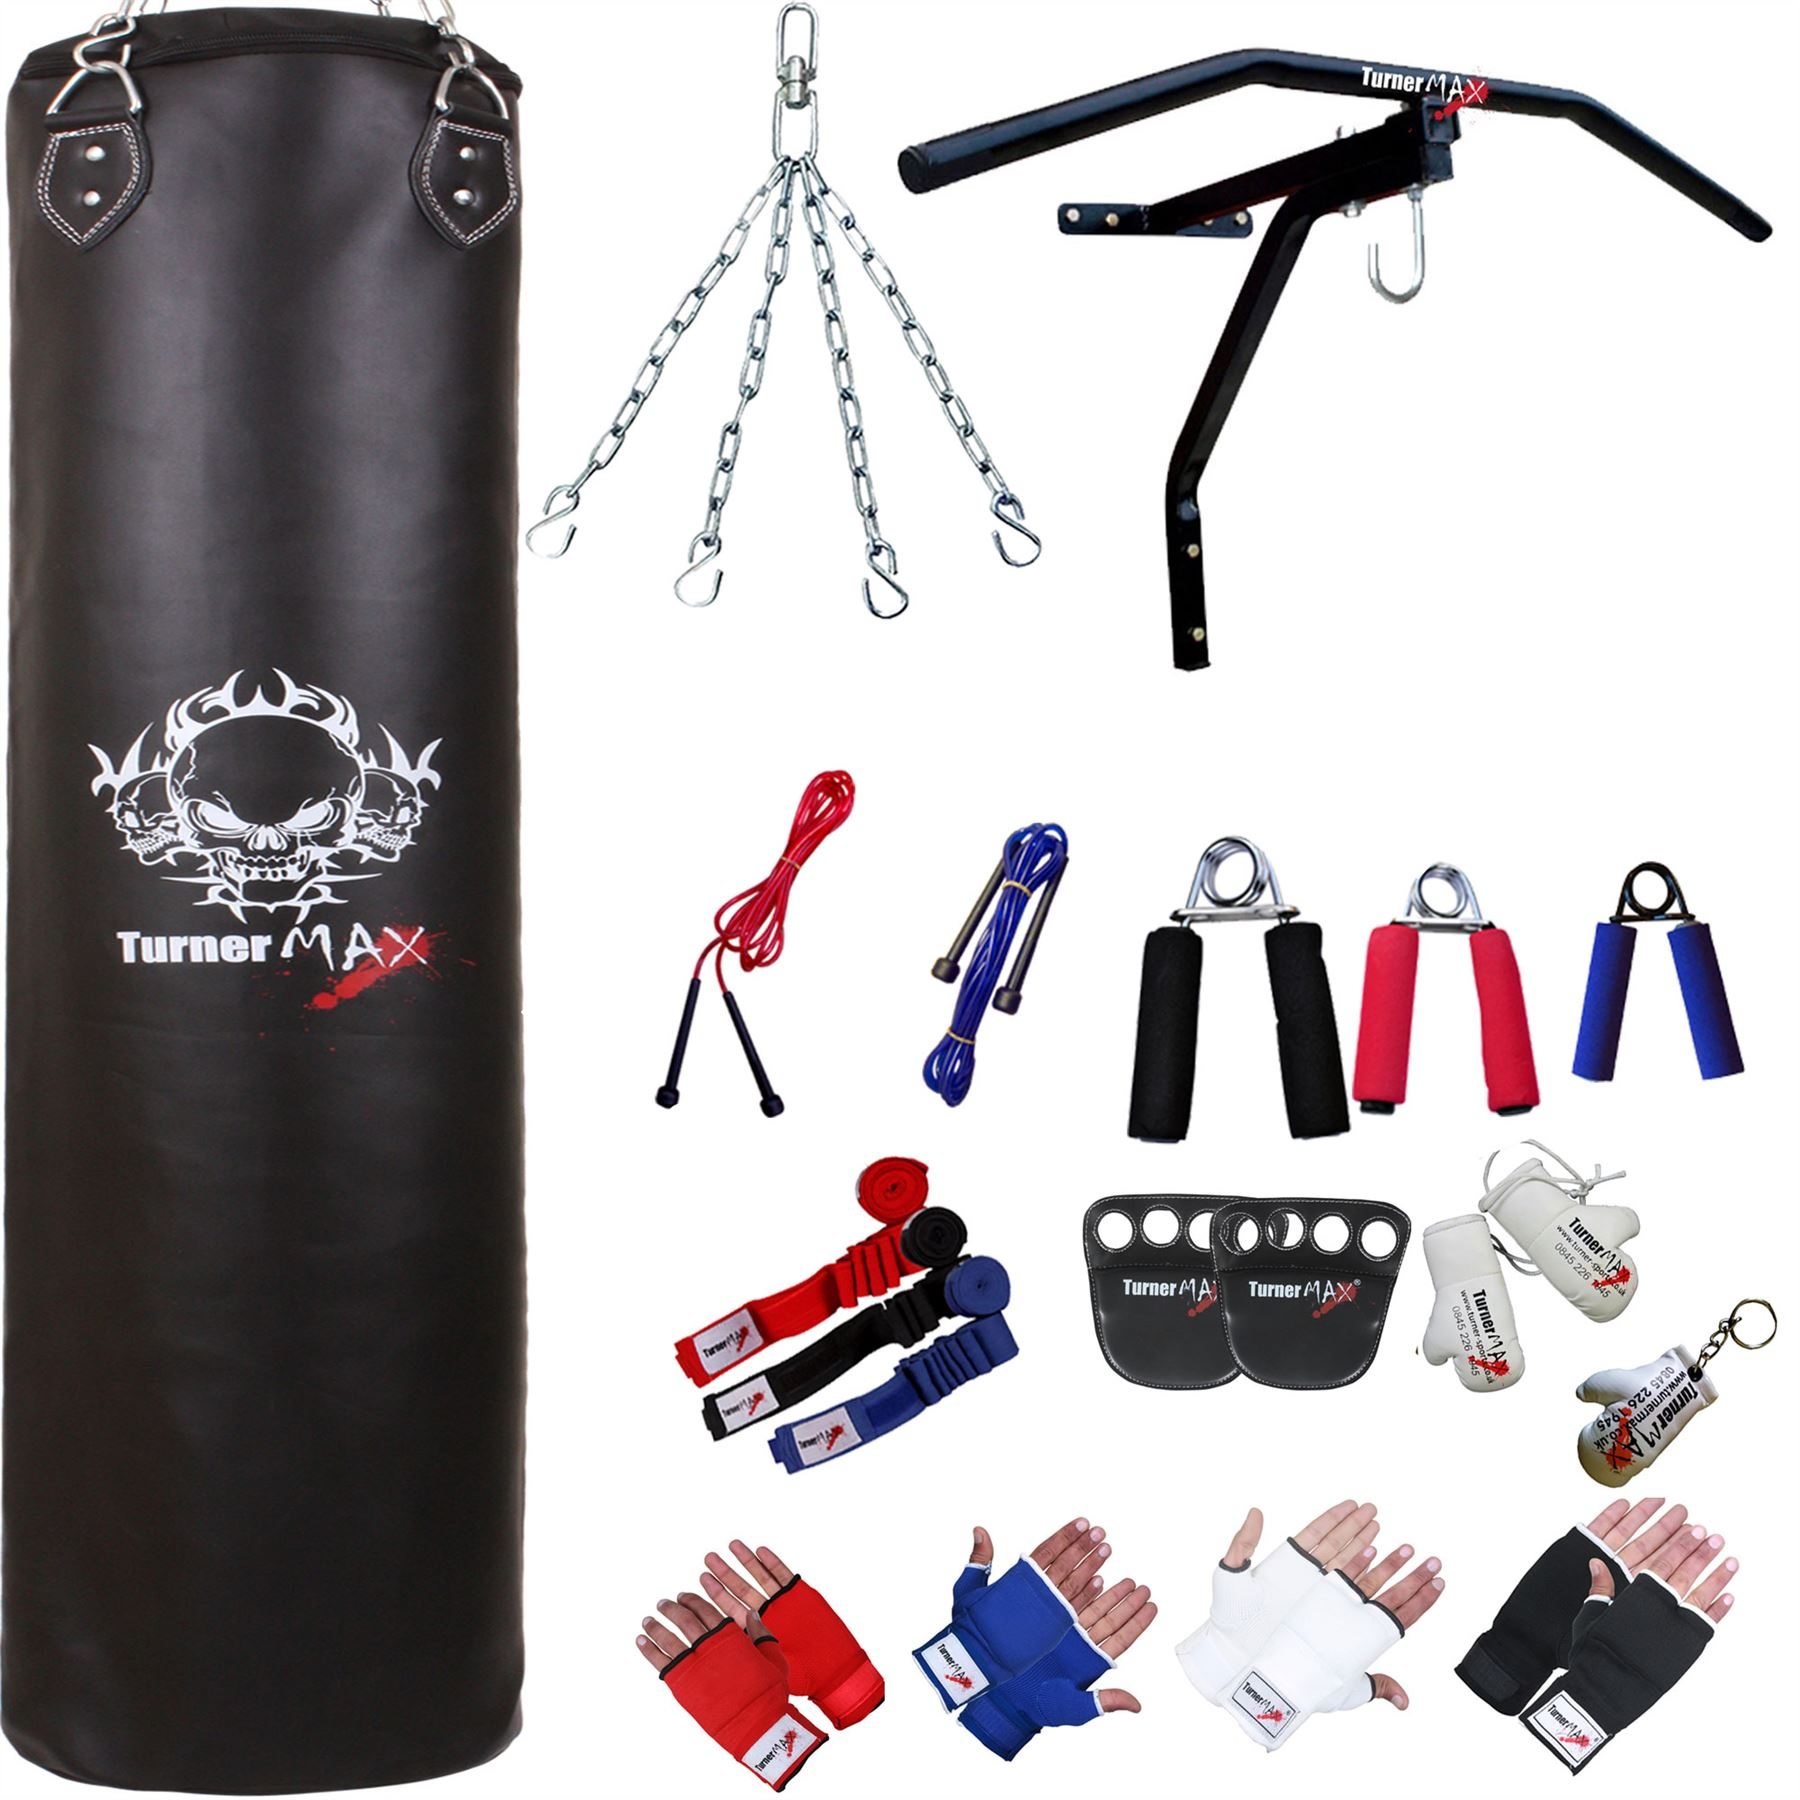 TurnerMAX-13-Piece-Punch-Bag-Set-Filled-Punch-Bag-Wraps-Boxing-Gloves-Bracket